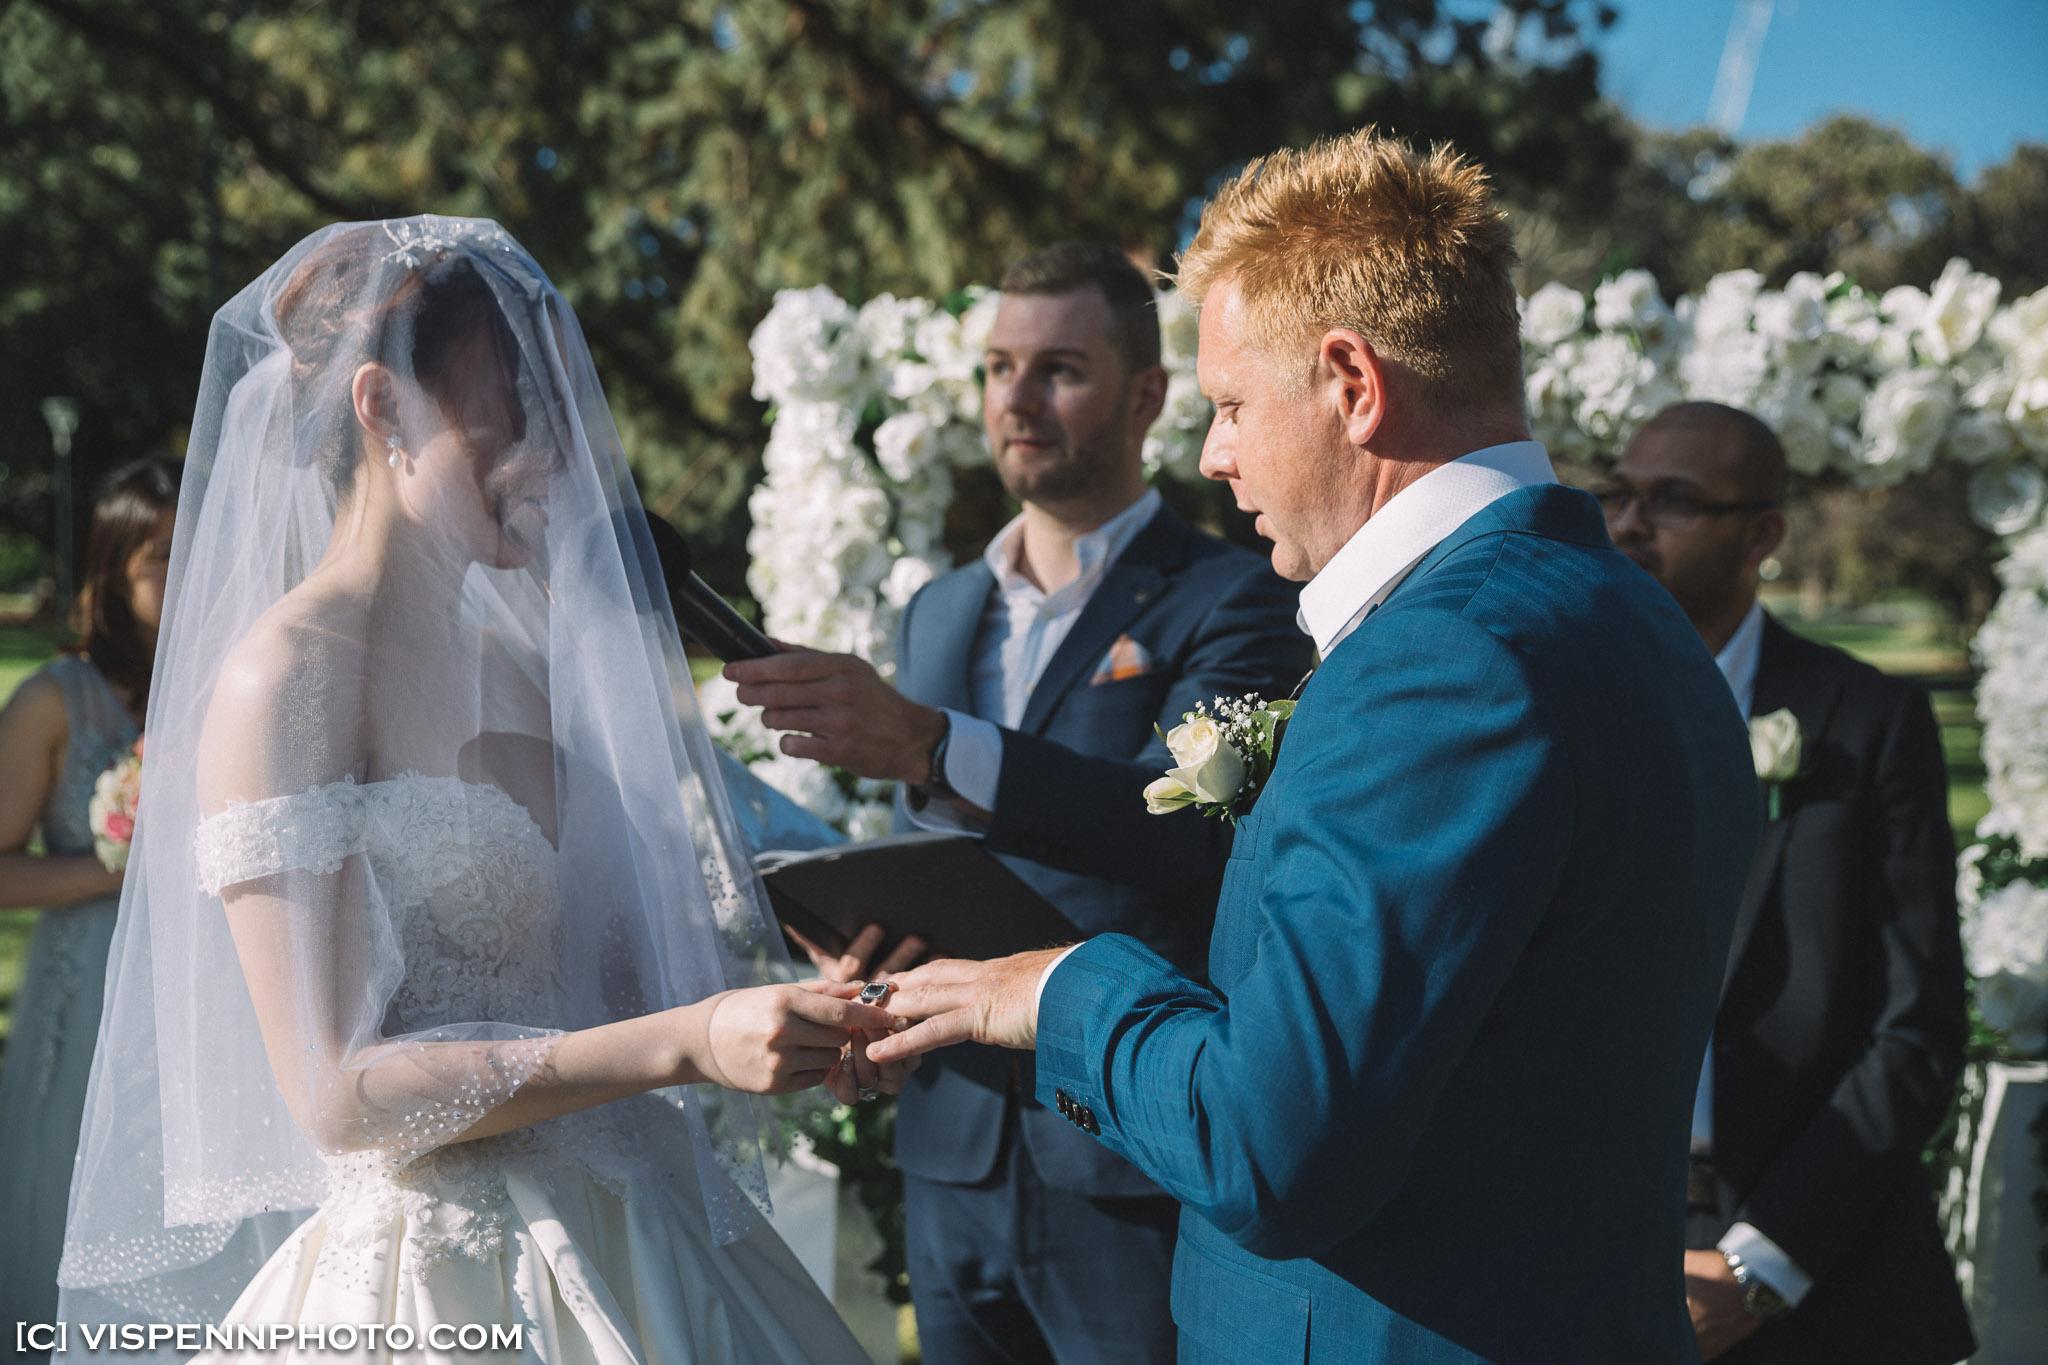 WEDDING DAY Photography Melbourne ZHPENN 1P 1DX 01300